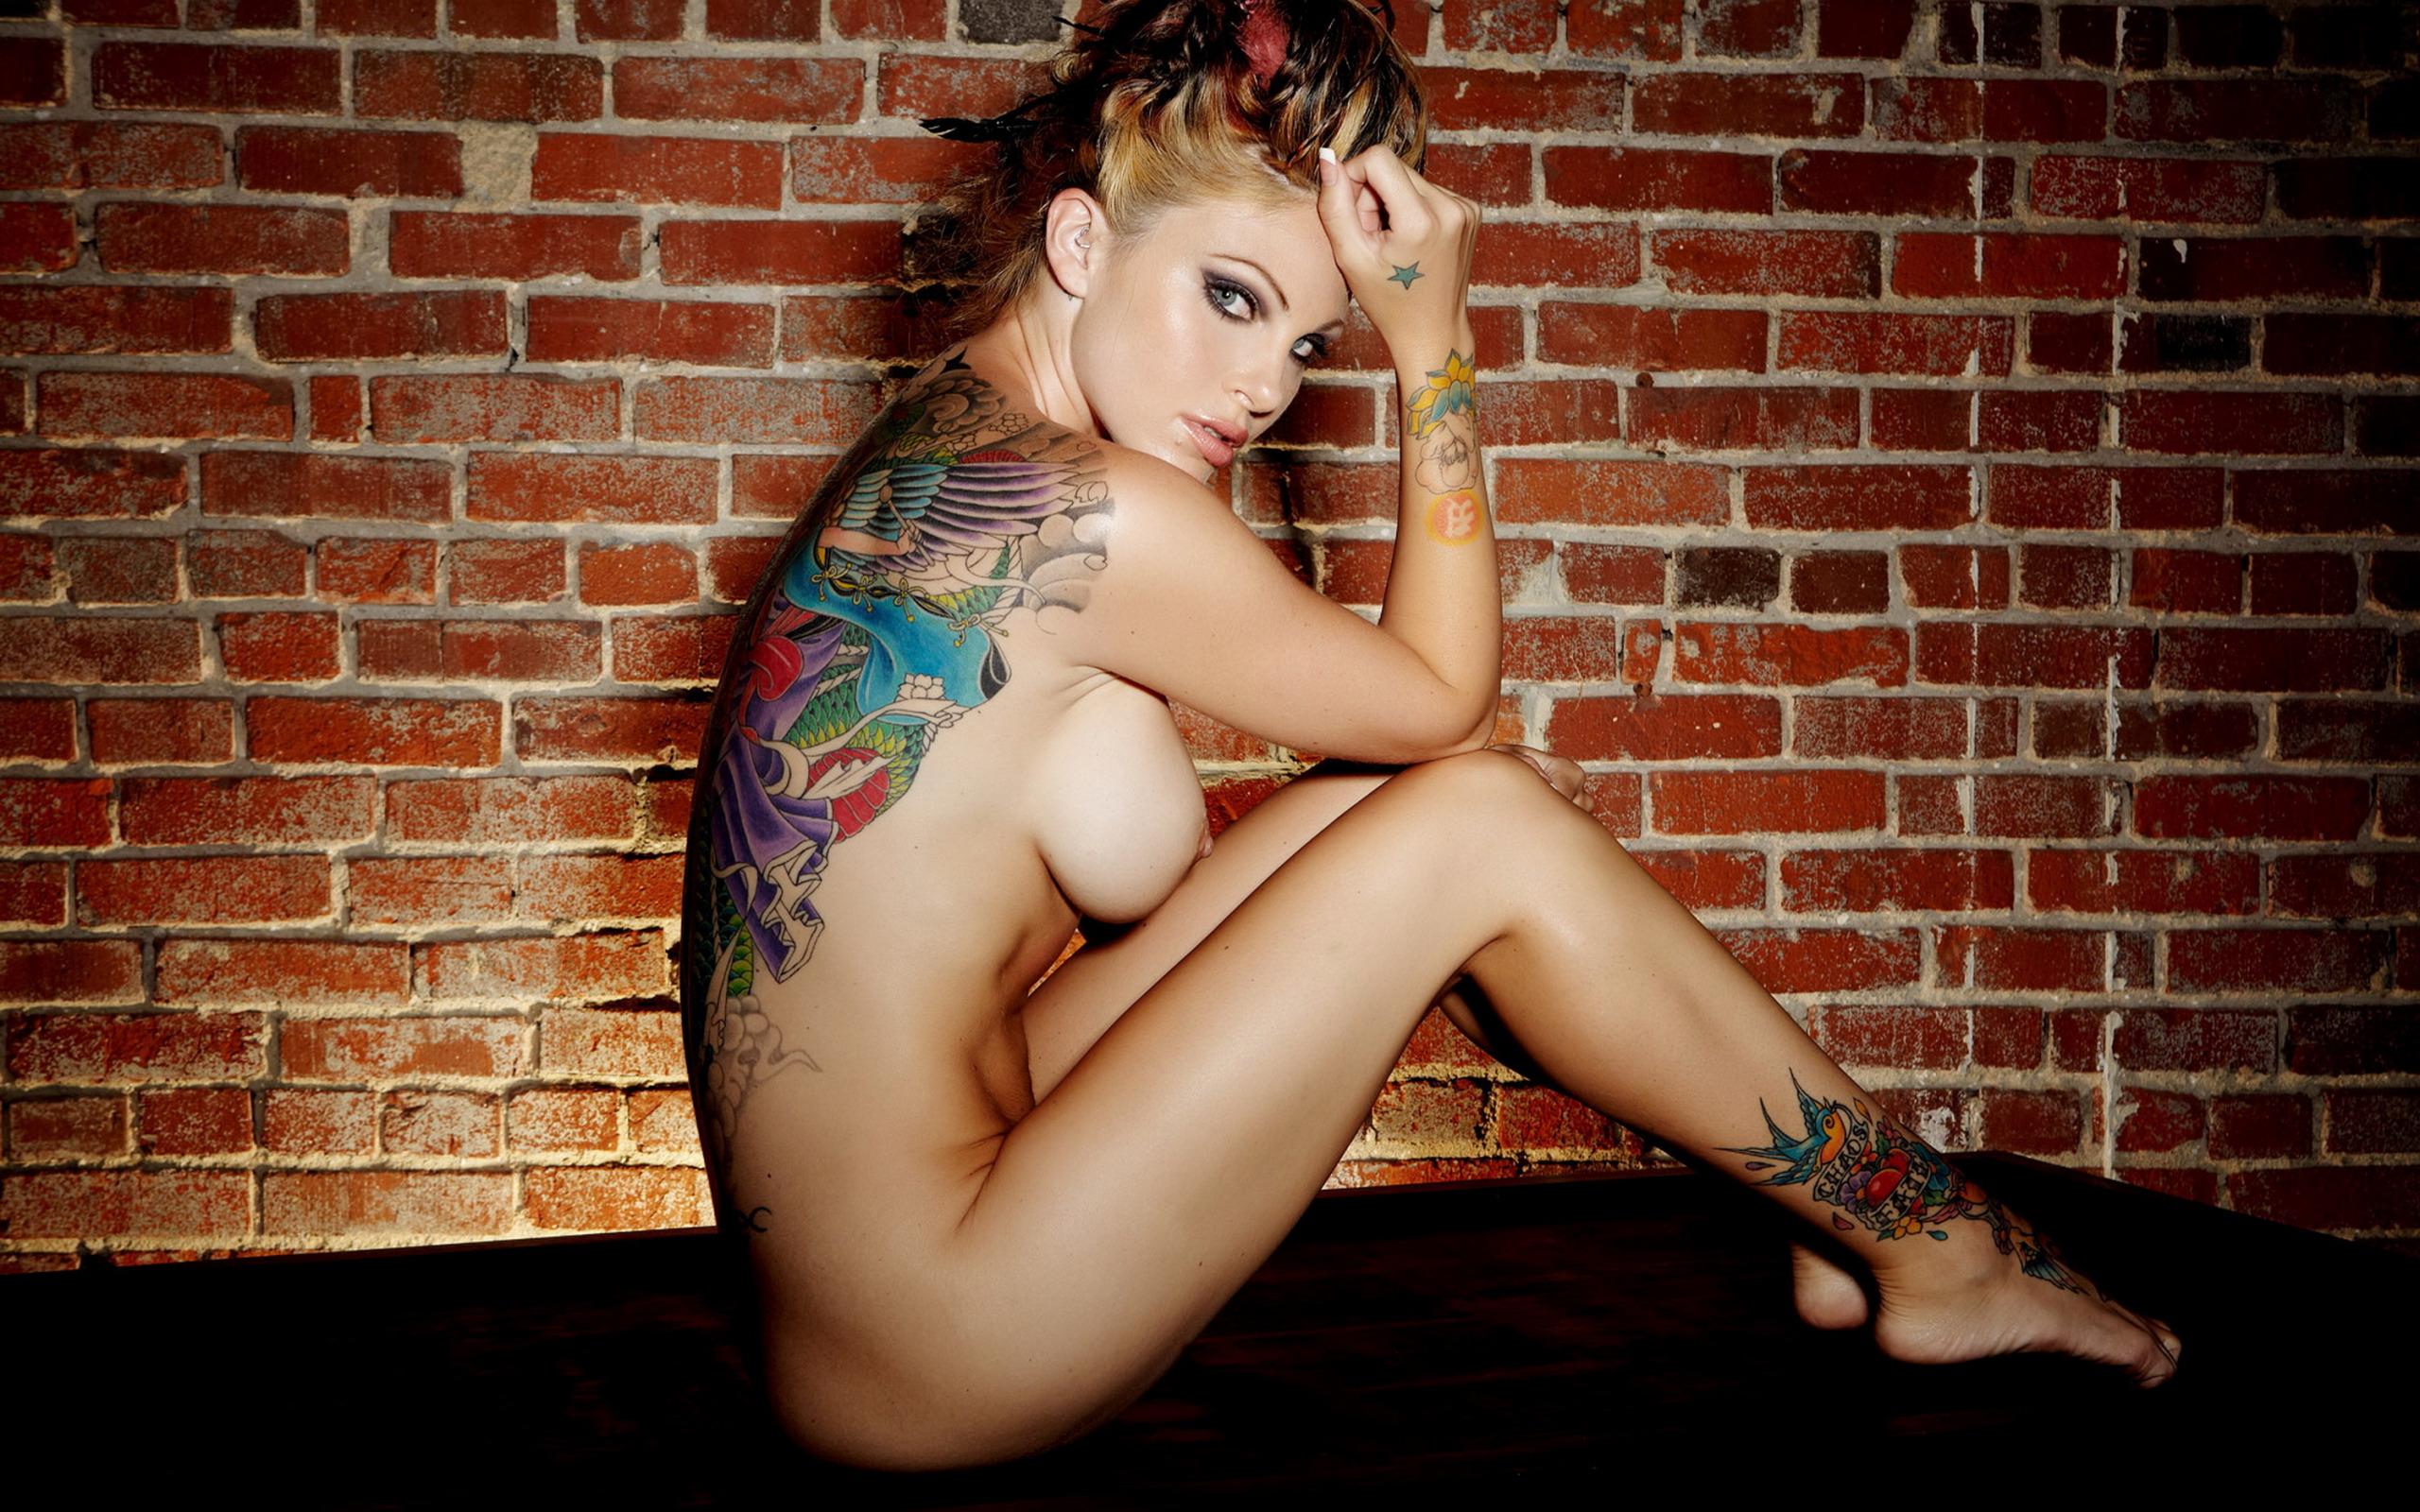 michelle-payne-tattoo-model-nude